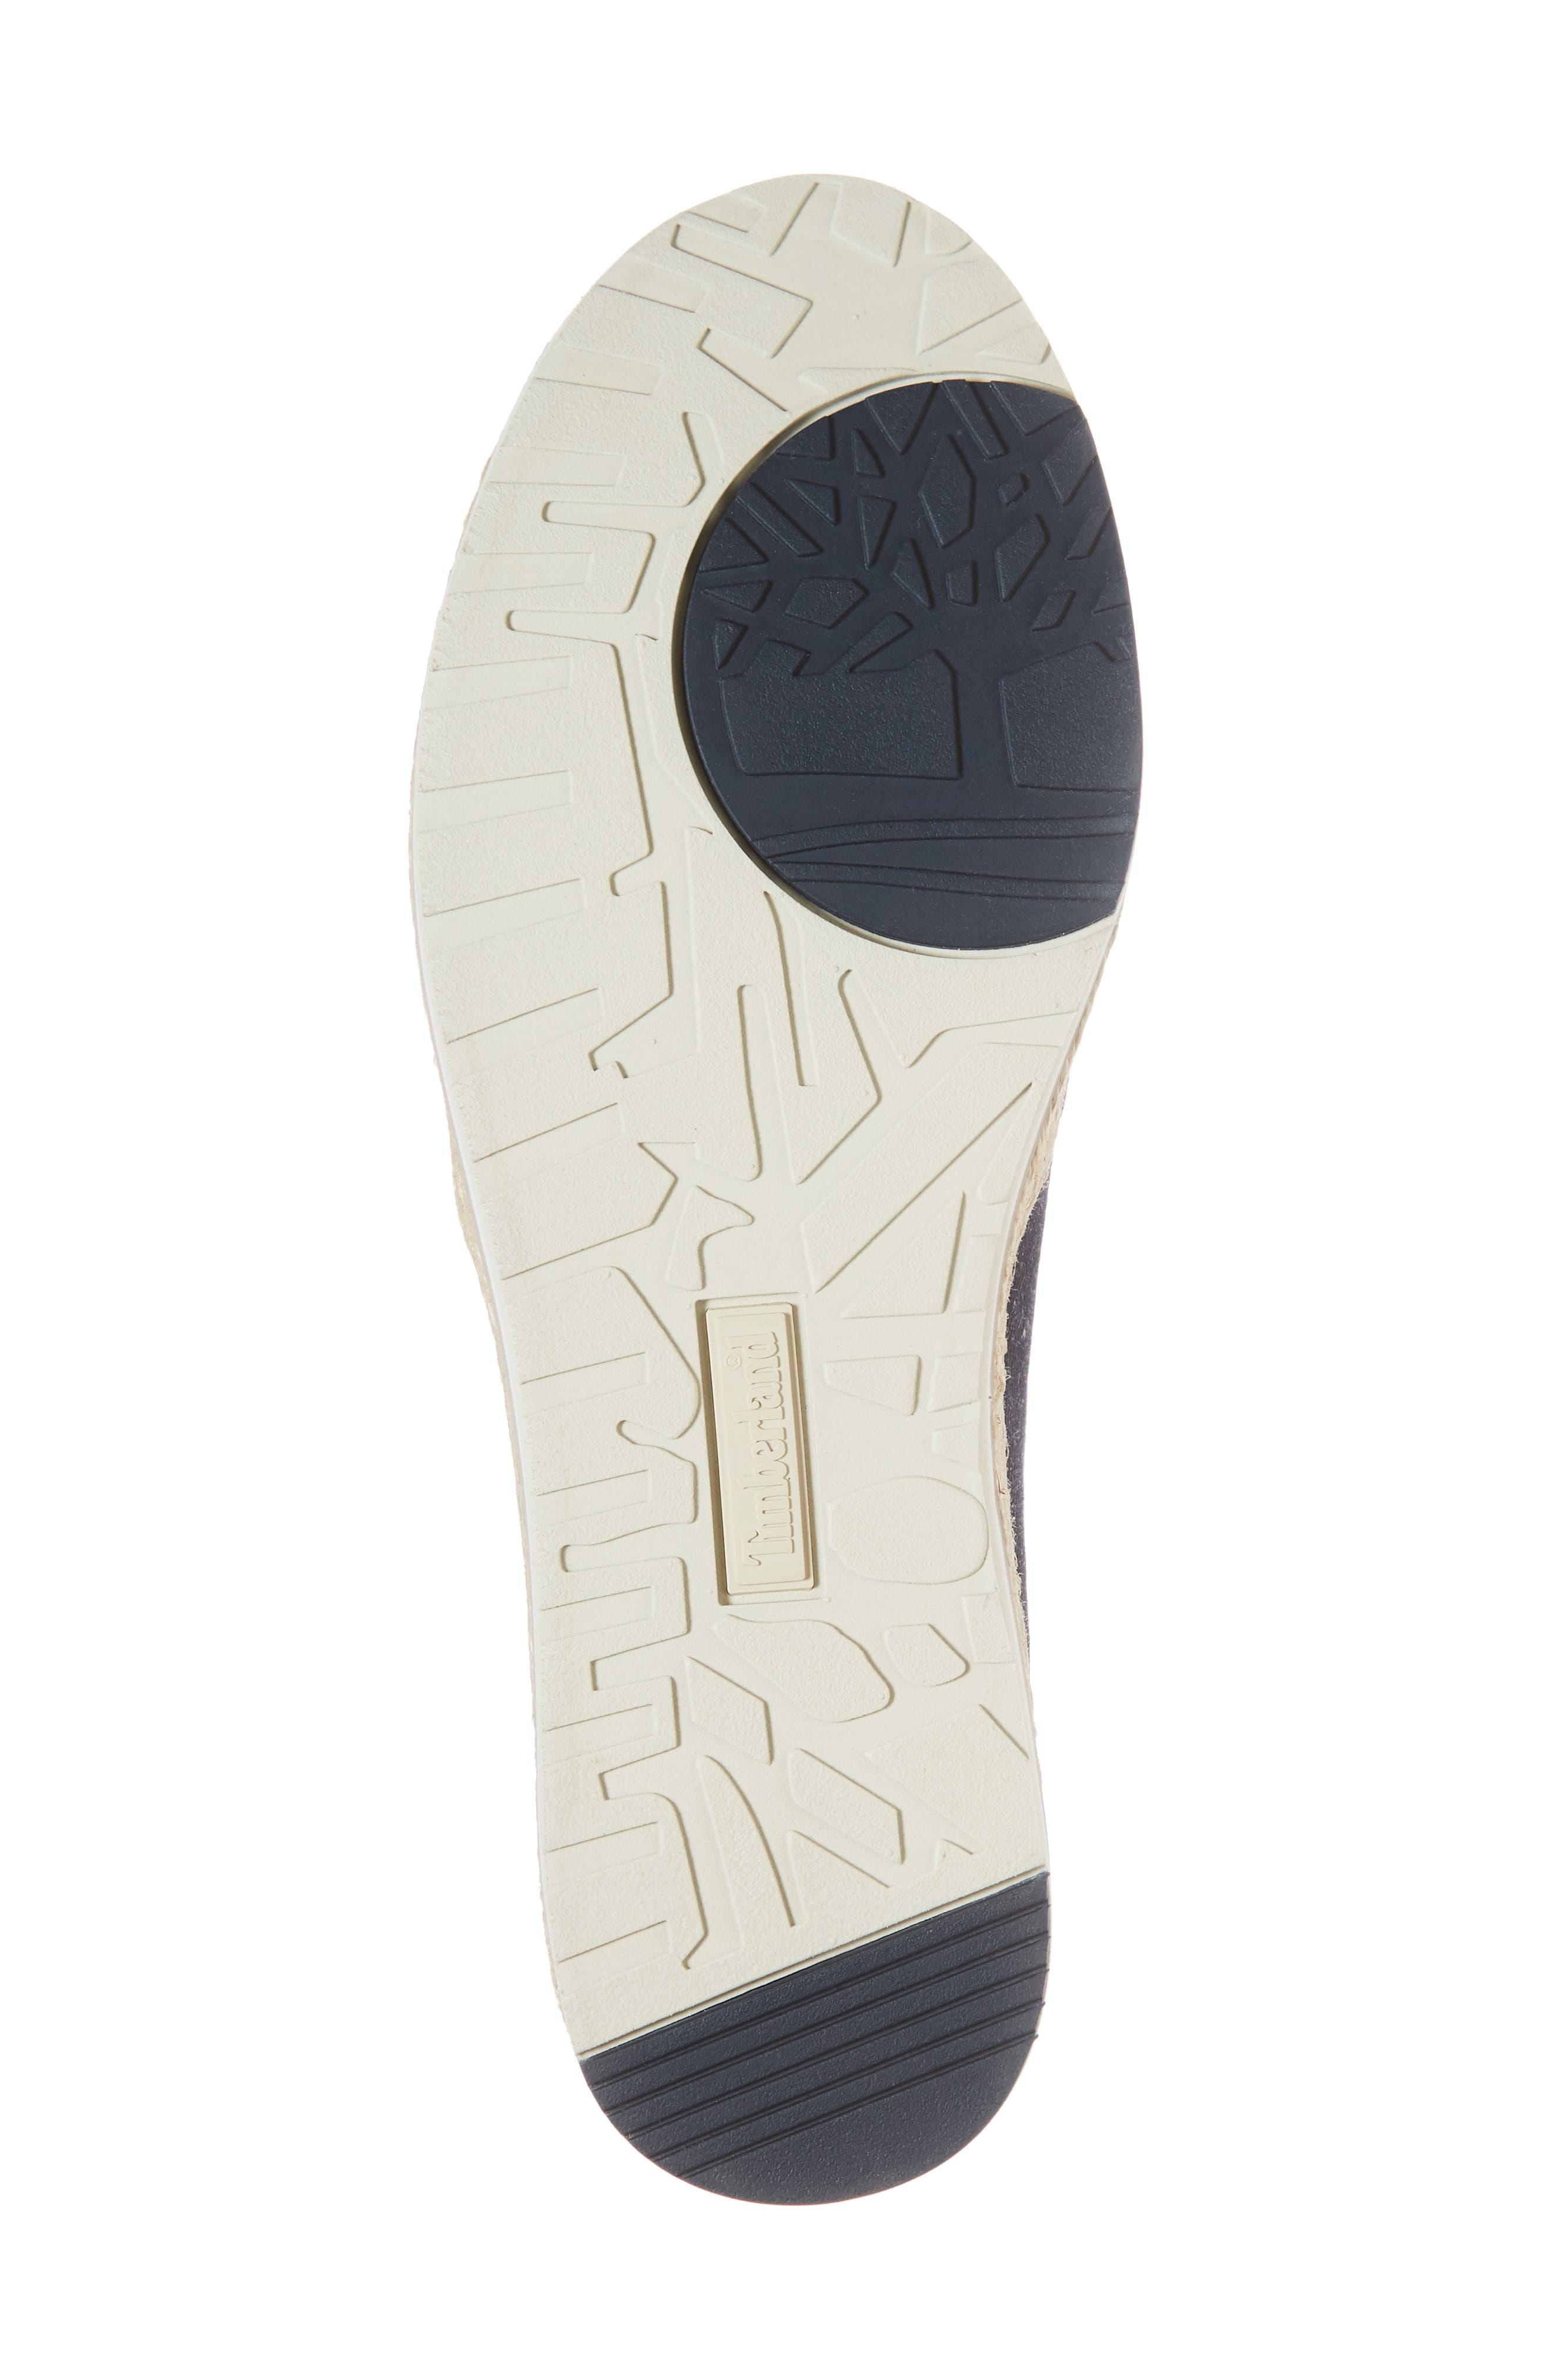 Eivissa Sea Slip-On Sneaker,                             Alternate thumbnail 6, color,                             Navy Canvas